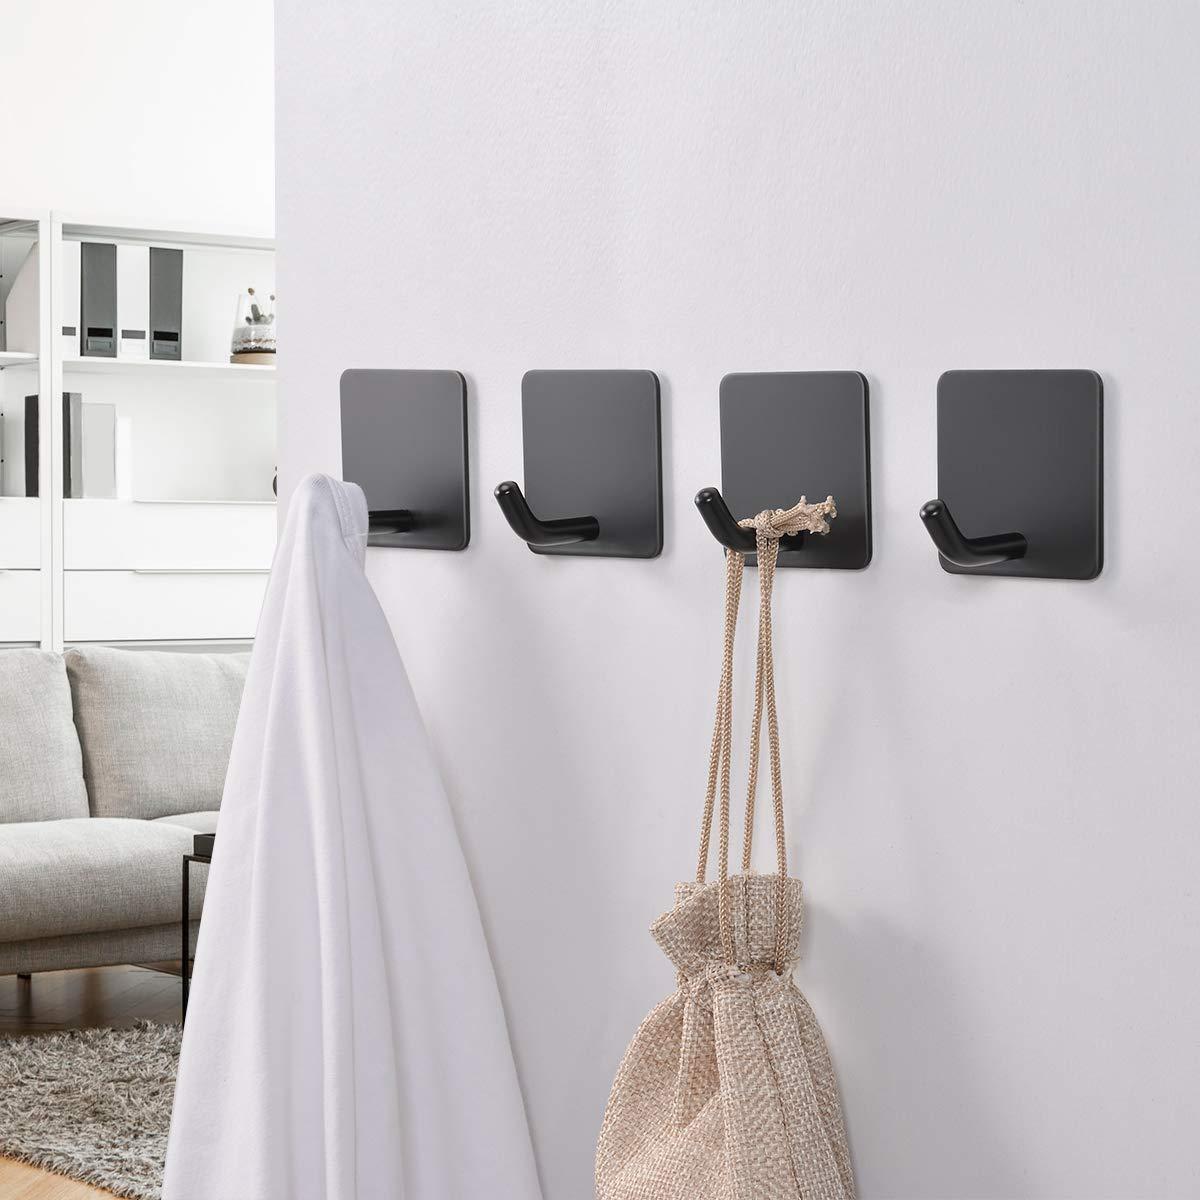 FLE Towel Hooks Self-Adhesive Wall Single Hook Kitchen 4 Packs Stainless Steel Black Coat Robe Hooks for Bathroom